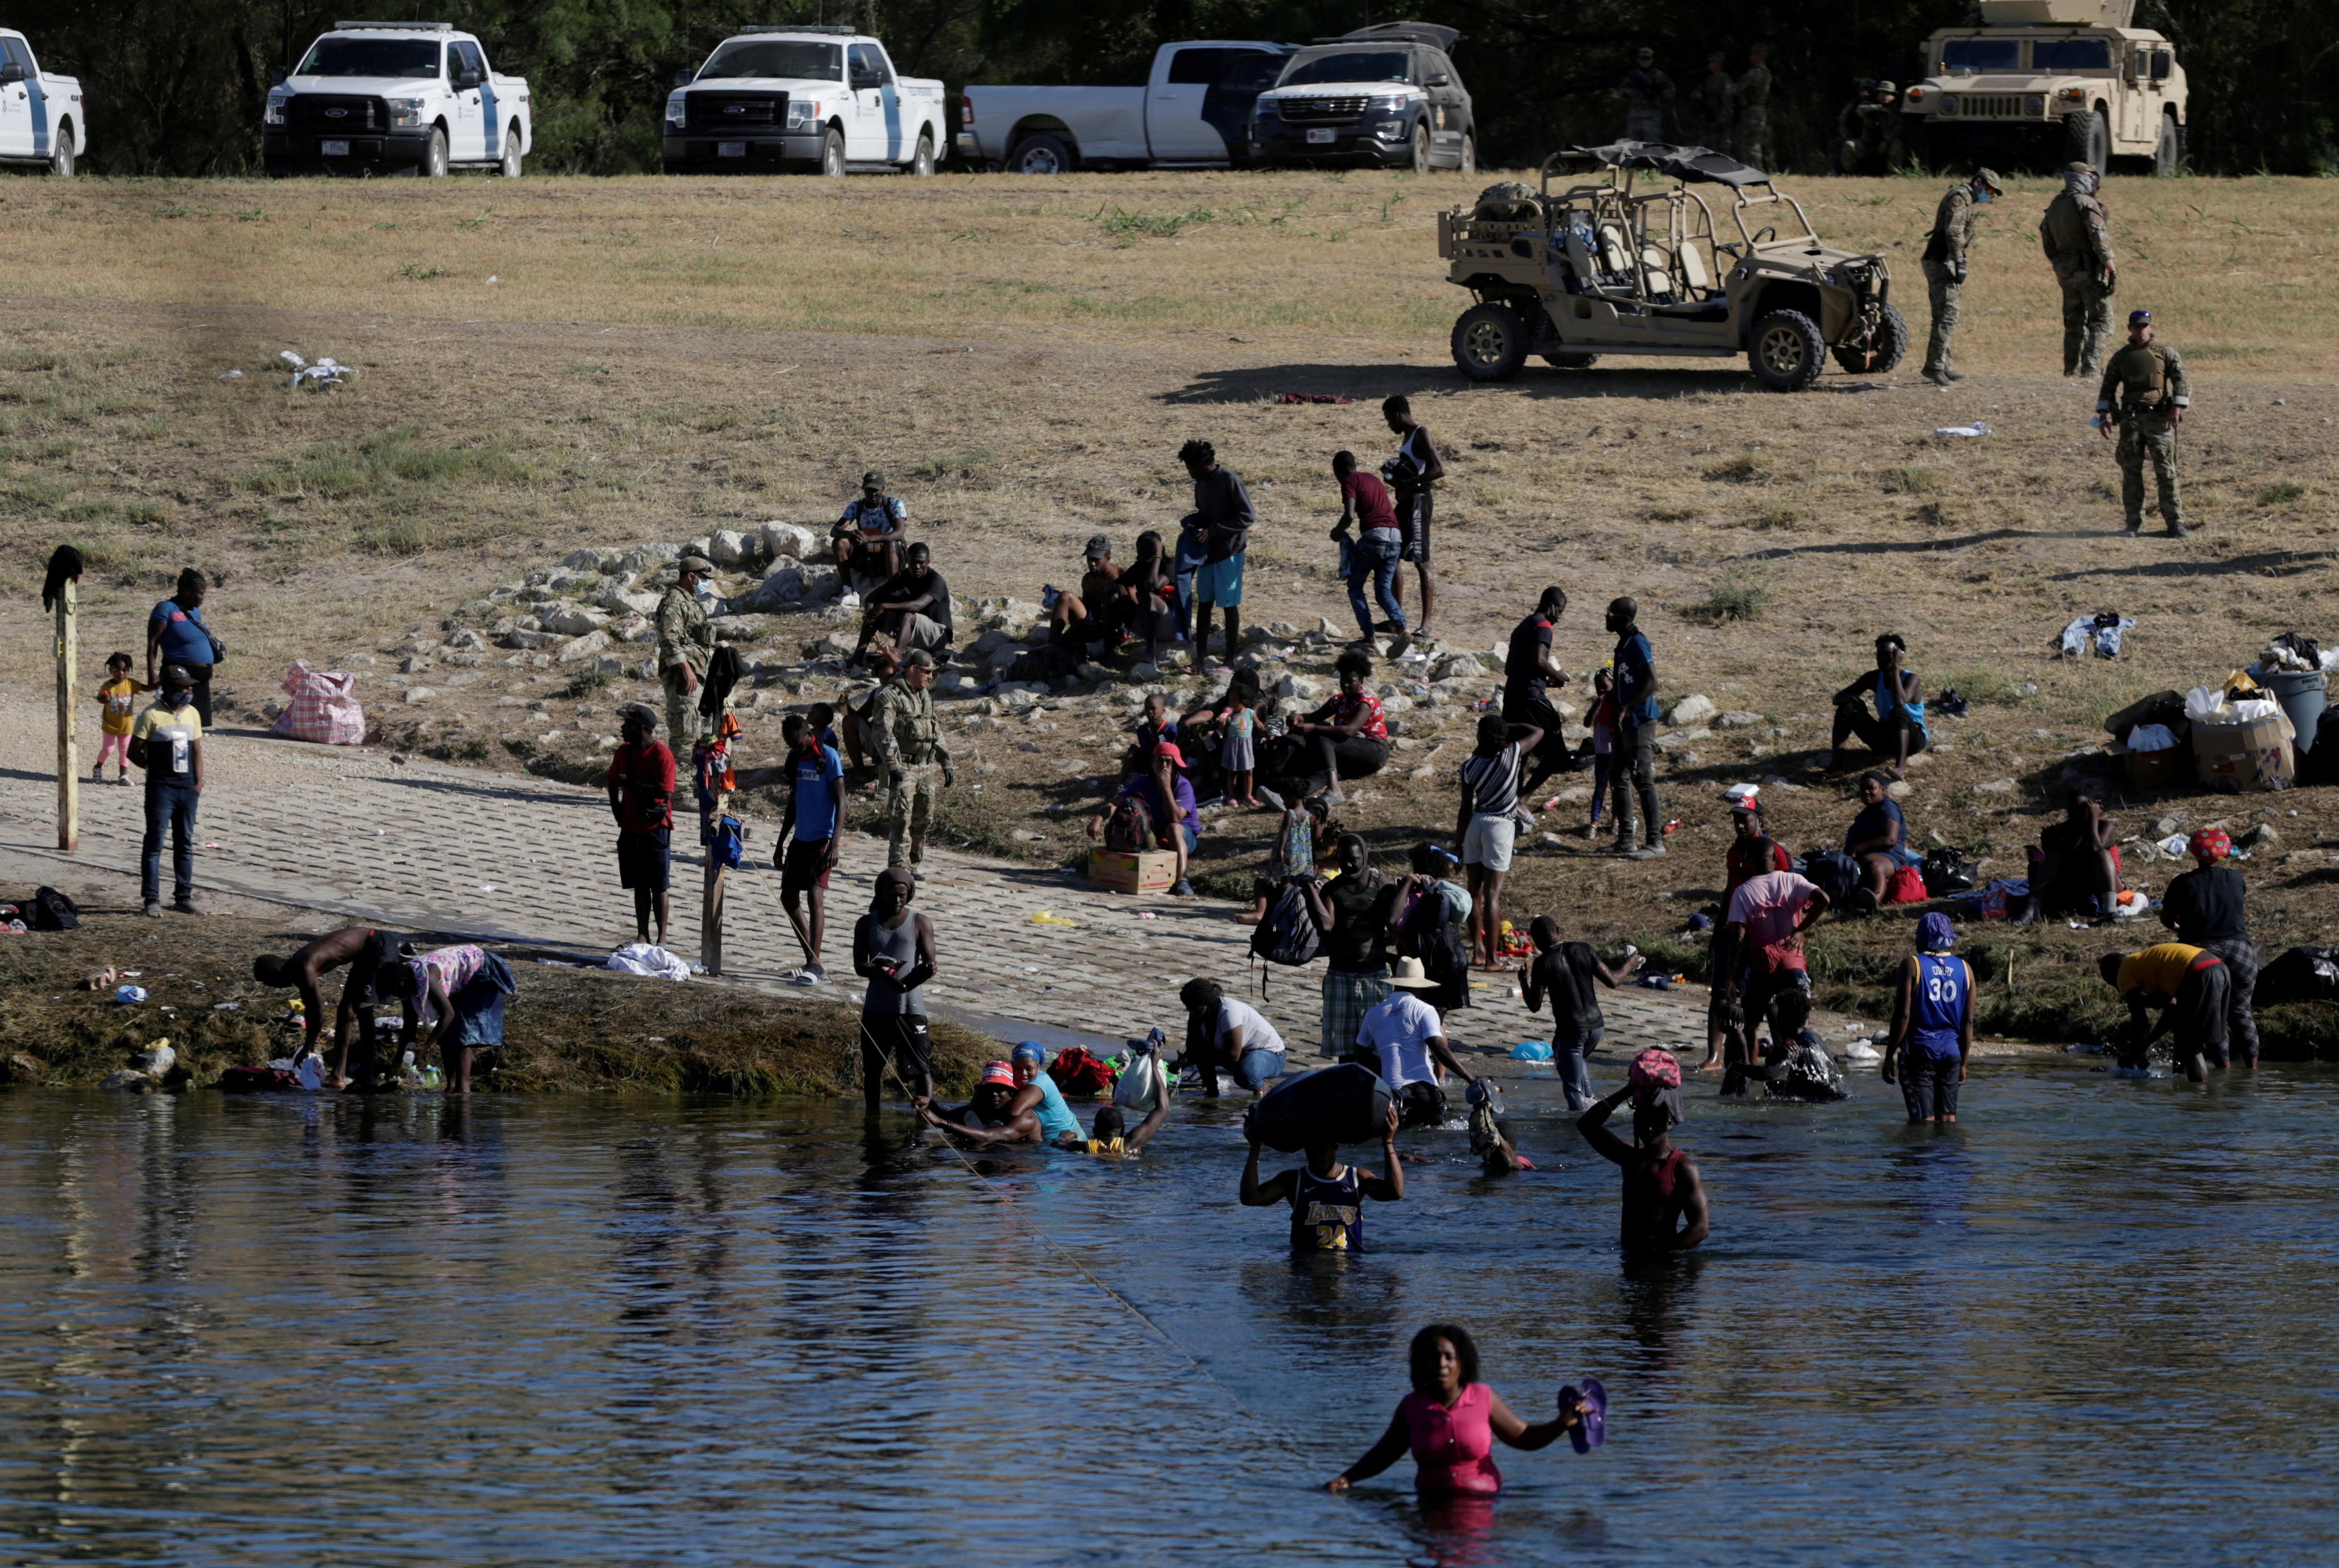 Migrants seeking refuge in the U.S. wade across the Rio Grande river from Del Rio, Texas, U.S. toward Ciudad Acuna, Mexico, in Ciudad Acuna, Mexico September 22, 2021. REUTERS/Daniel Becerril